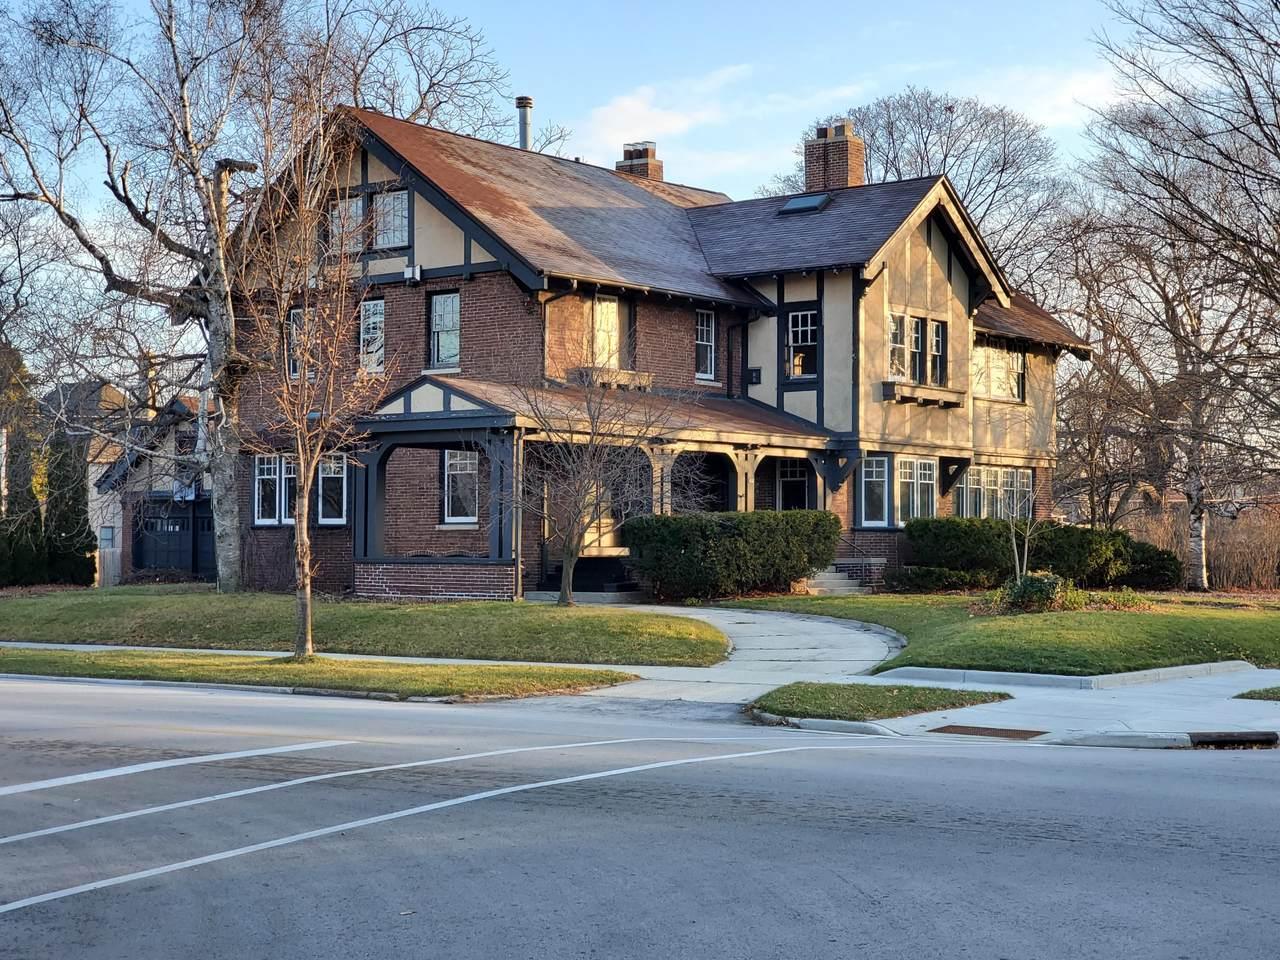 632 Michigan Ave - Photo 1